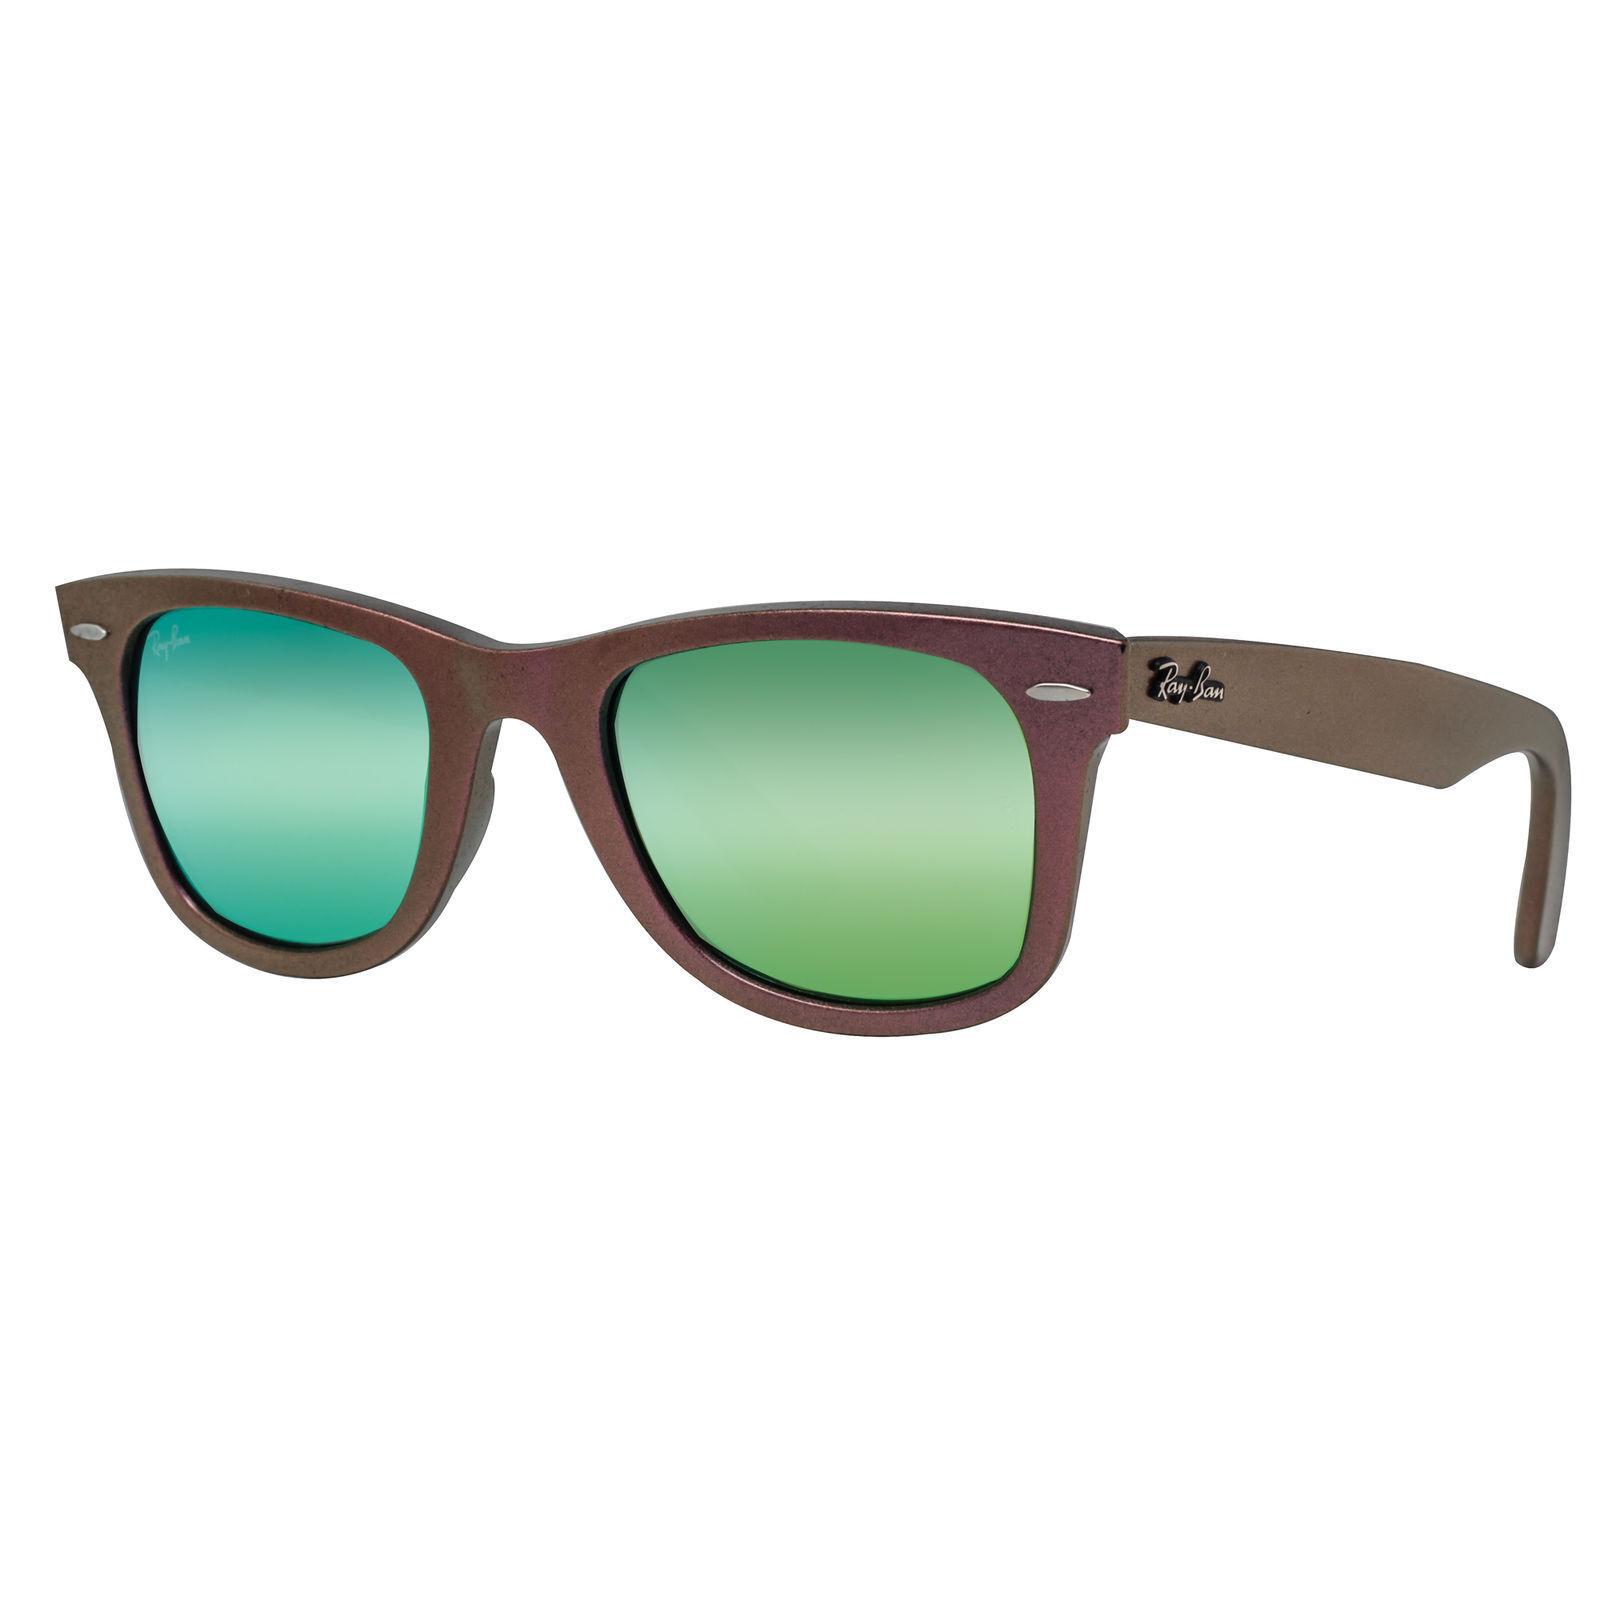 738e3e230775e Details about Ray-Ban Original Wayfarer RB2140 611019 50mm Cosmo Green Green  Flash Sunglasses